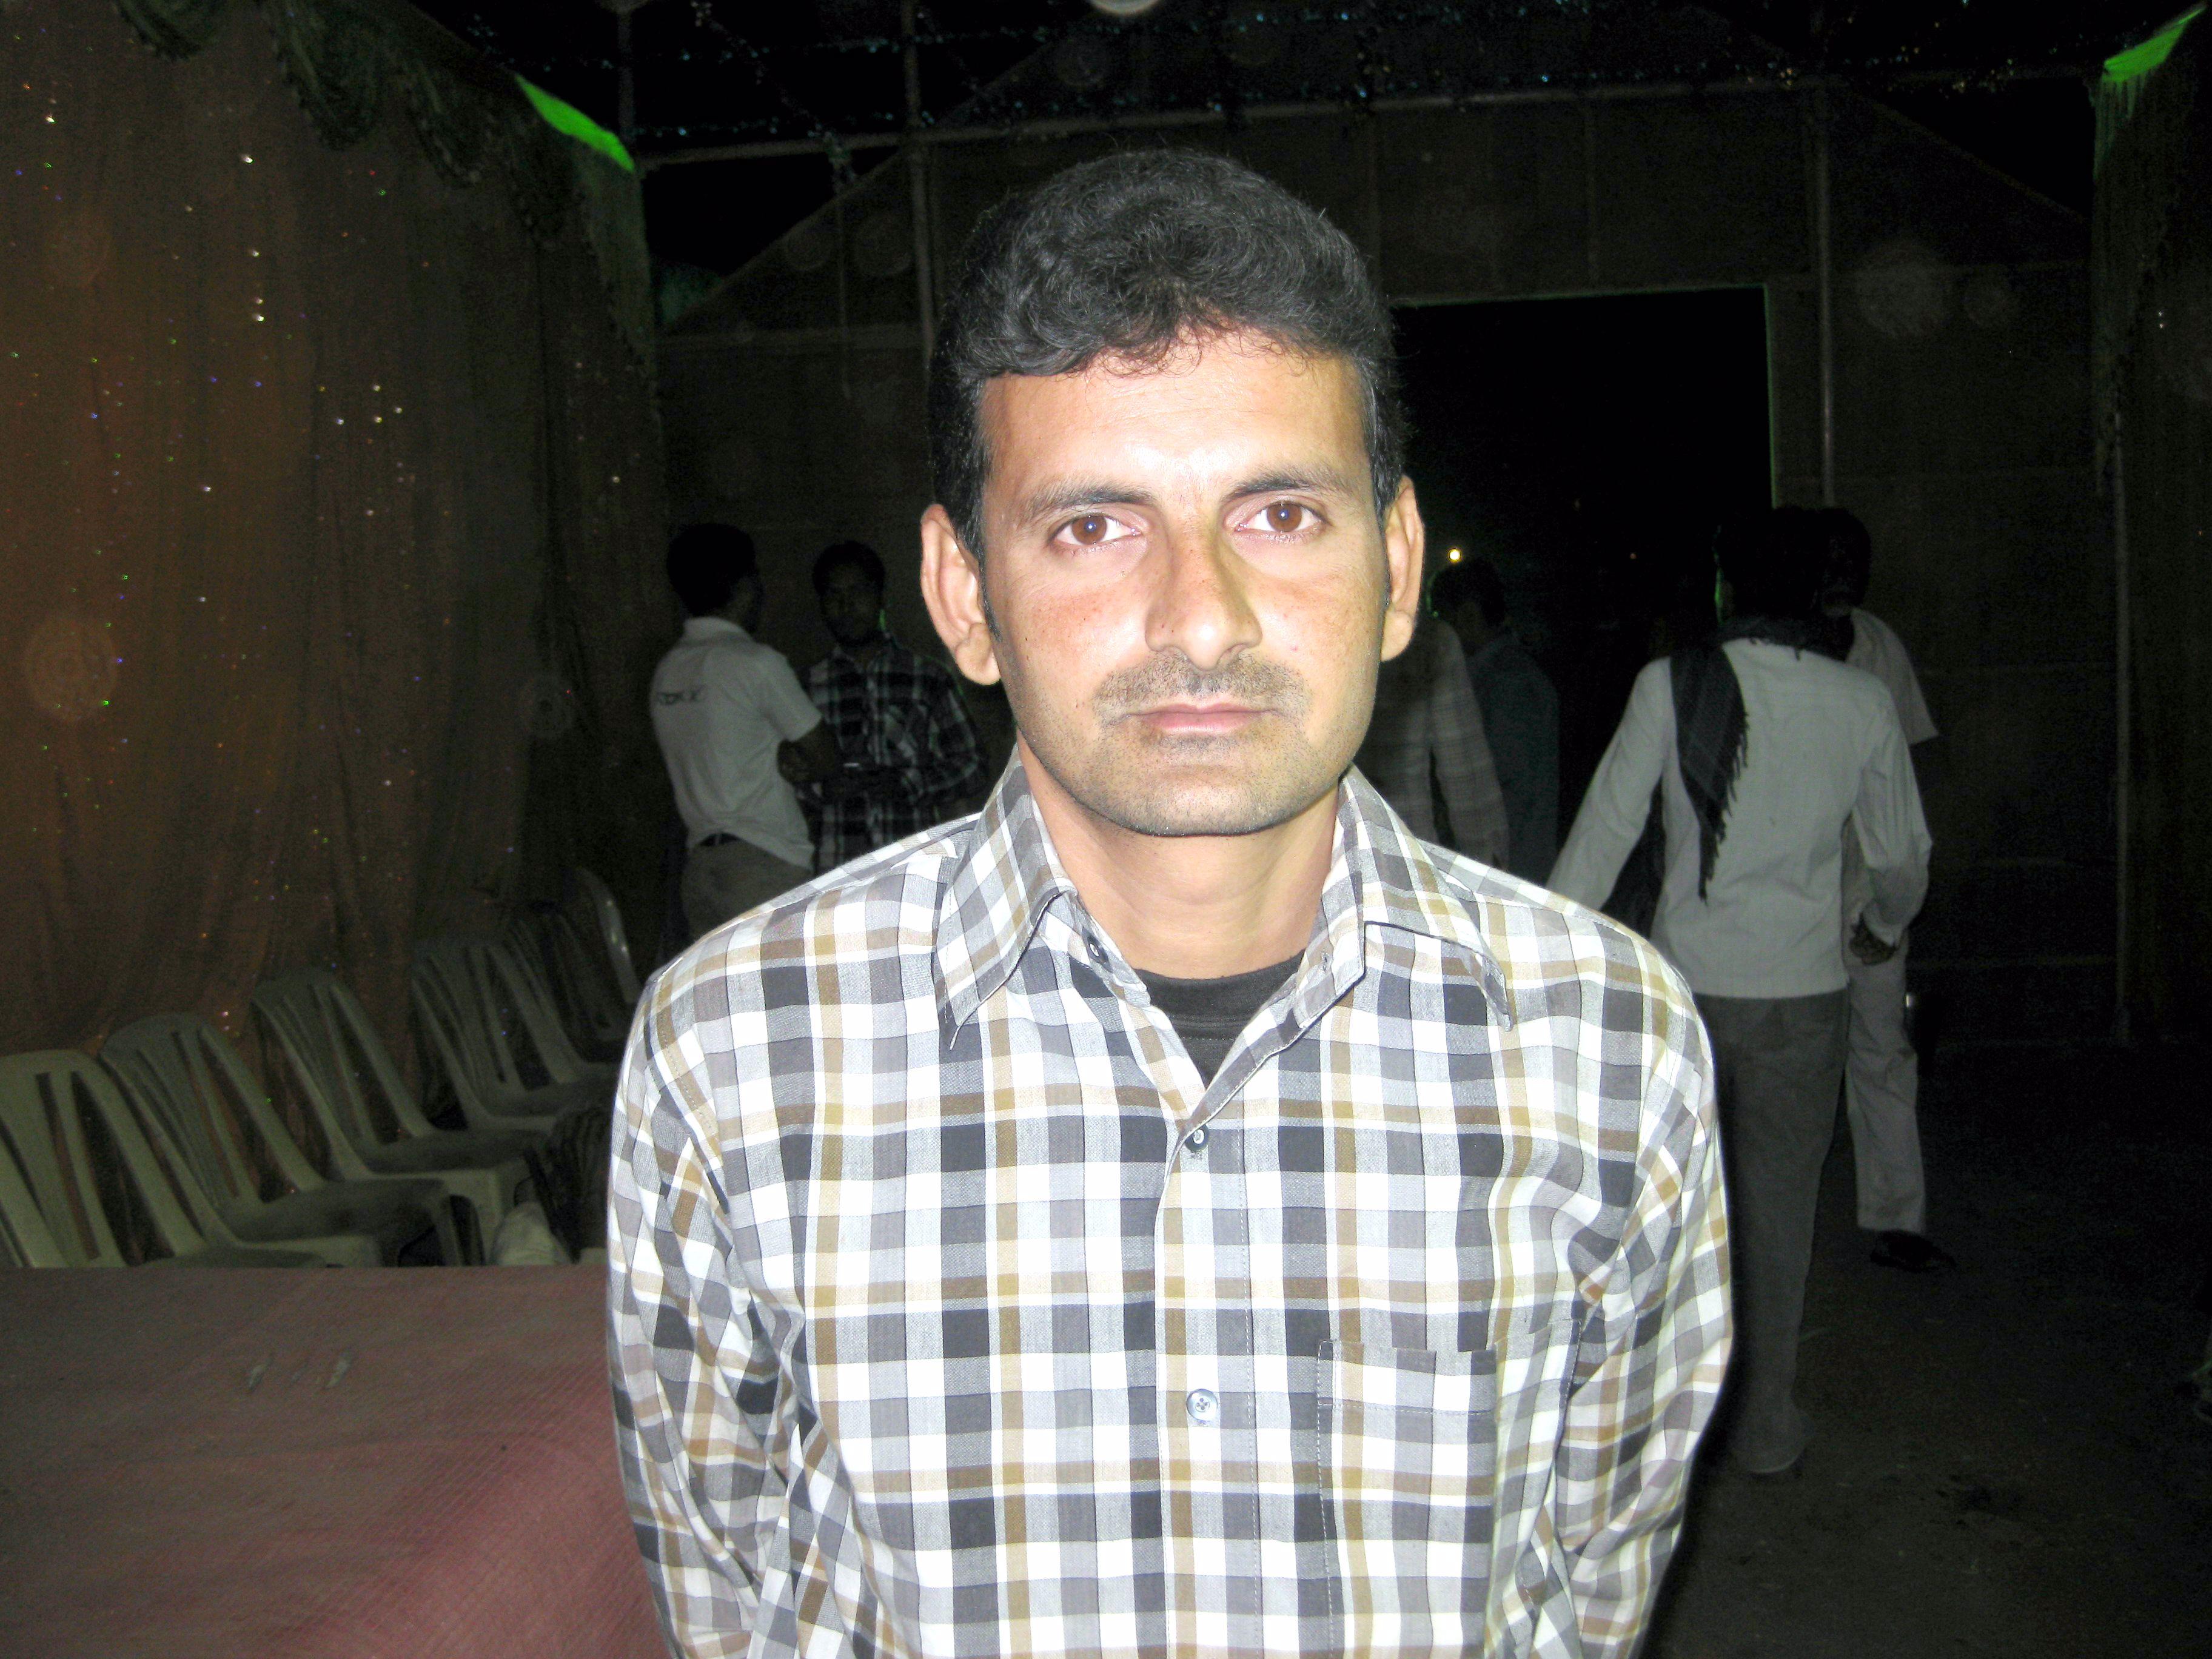 javedkhaniqbal